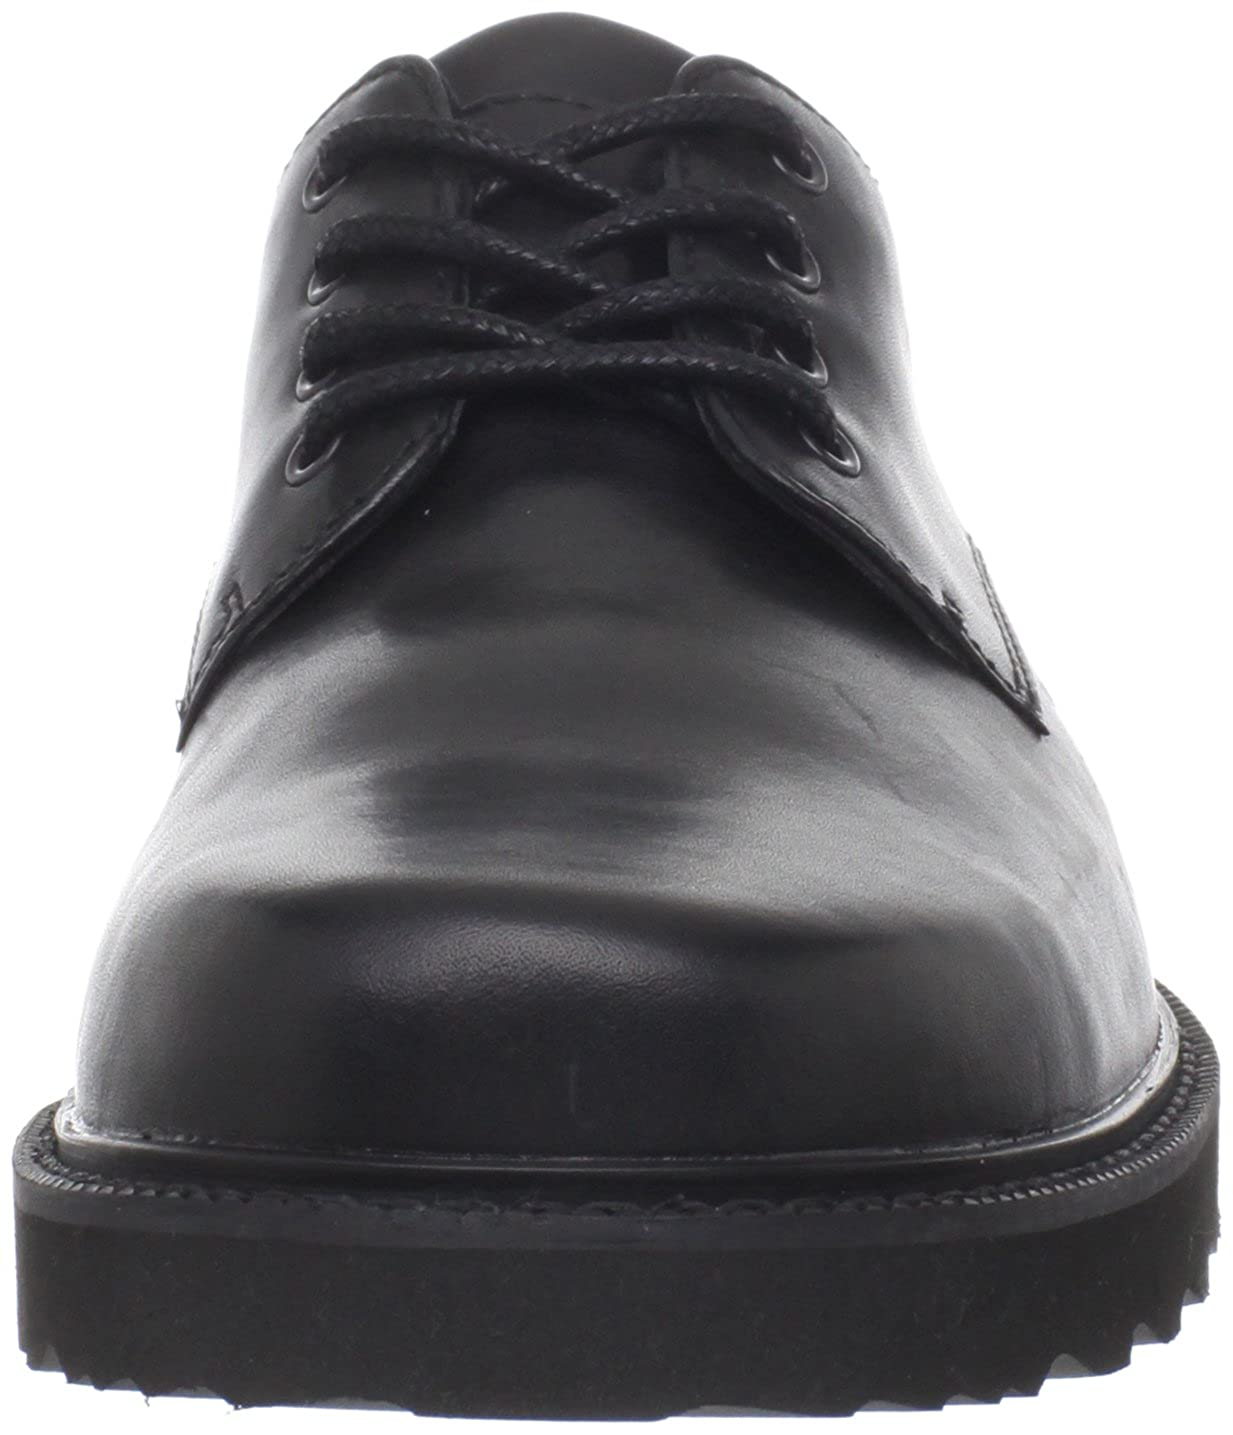 Rockport Rockport Rockport Northfield Leather, Herren Halbschuhe B000W8YAH4  40dd84